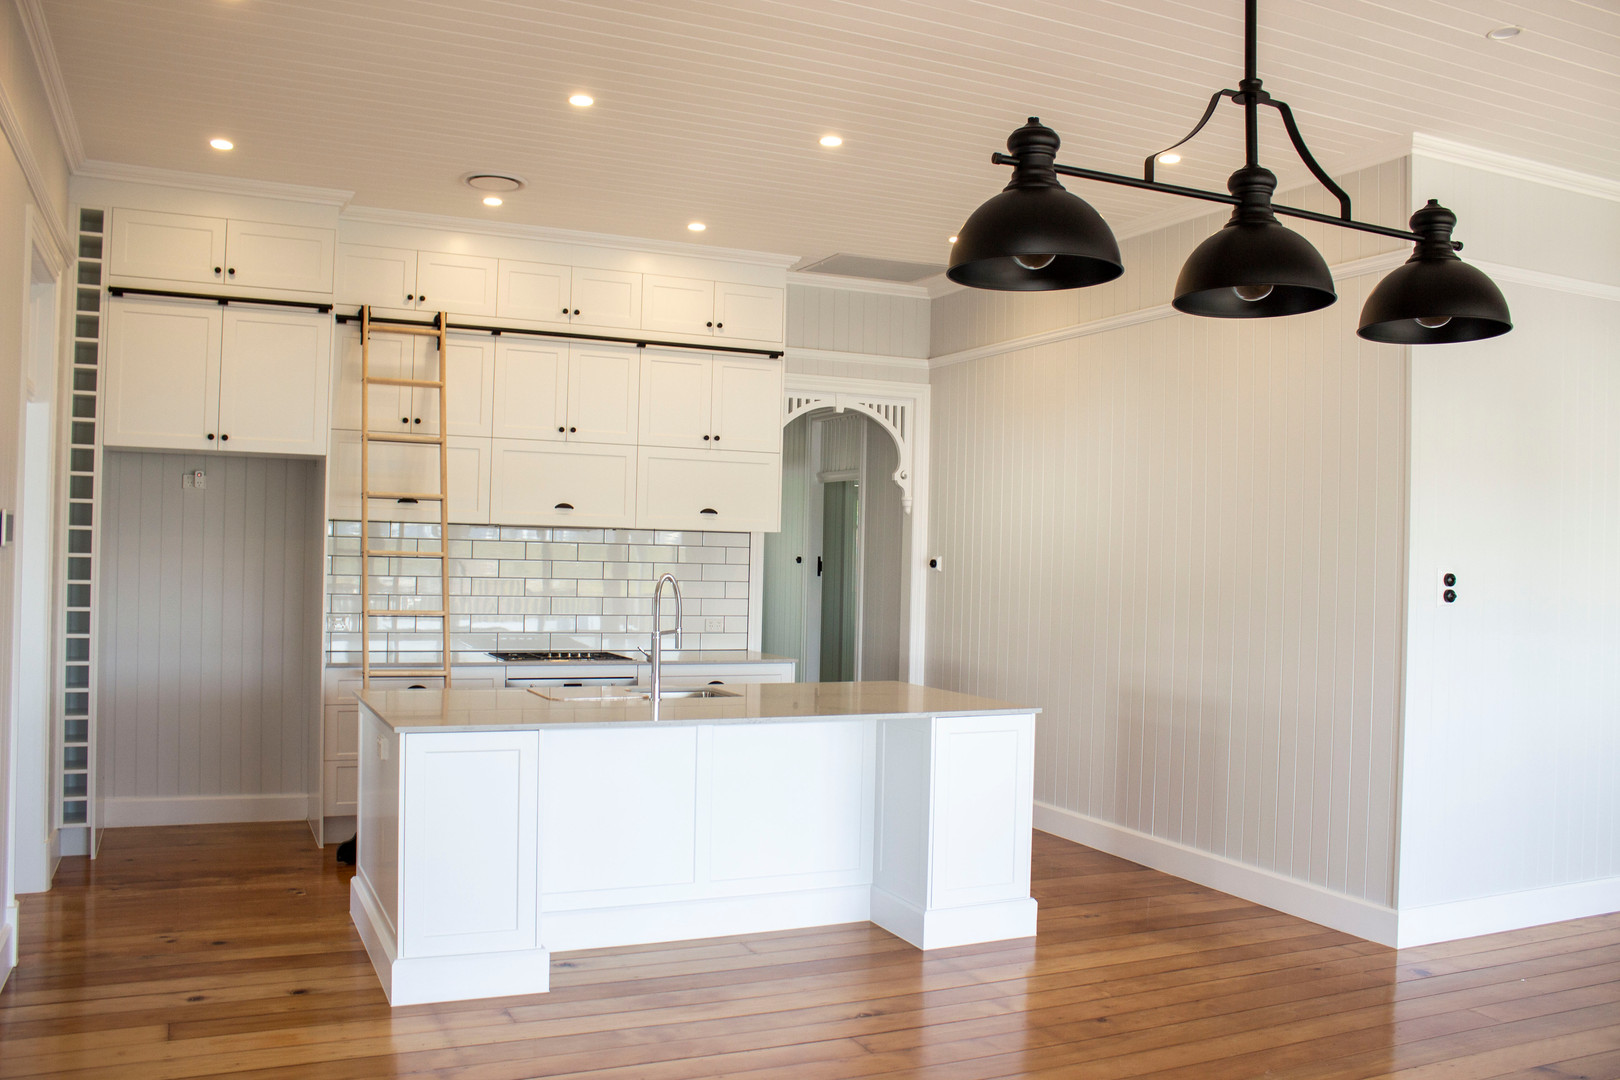 open kitchen with black lights, island b